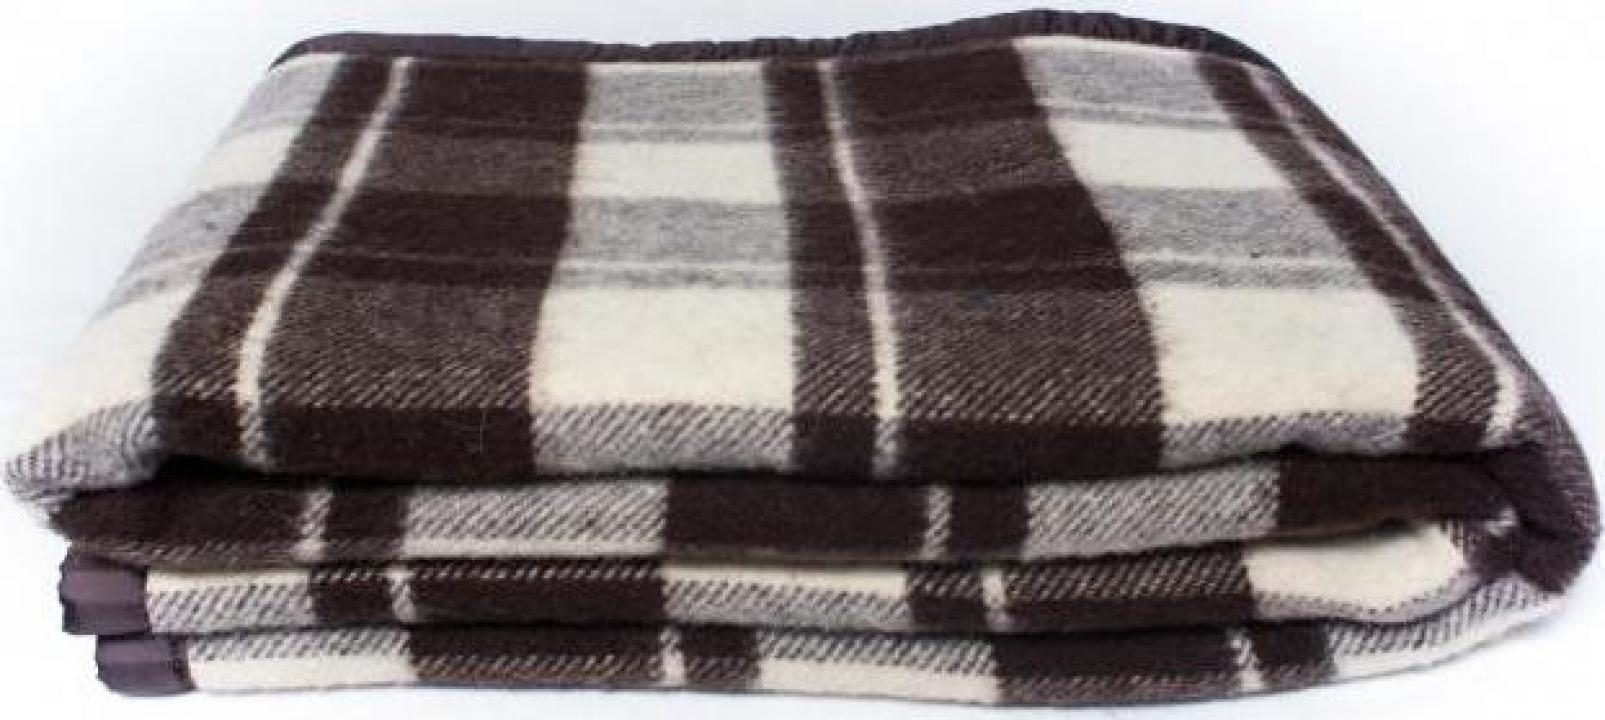 Patura Andreea 70% lana, 140x200, 2 kg